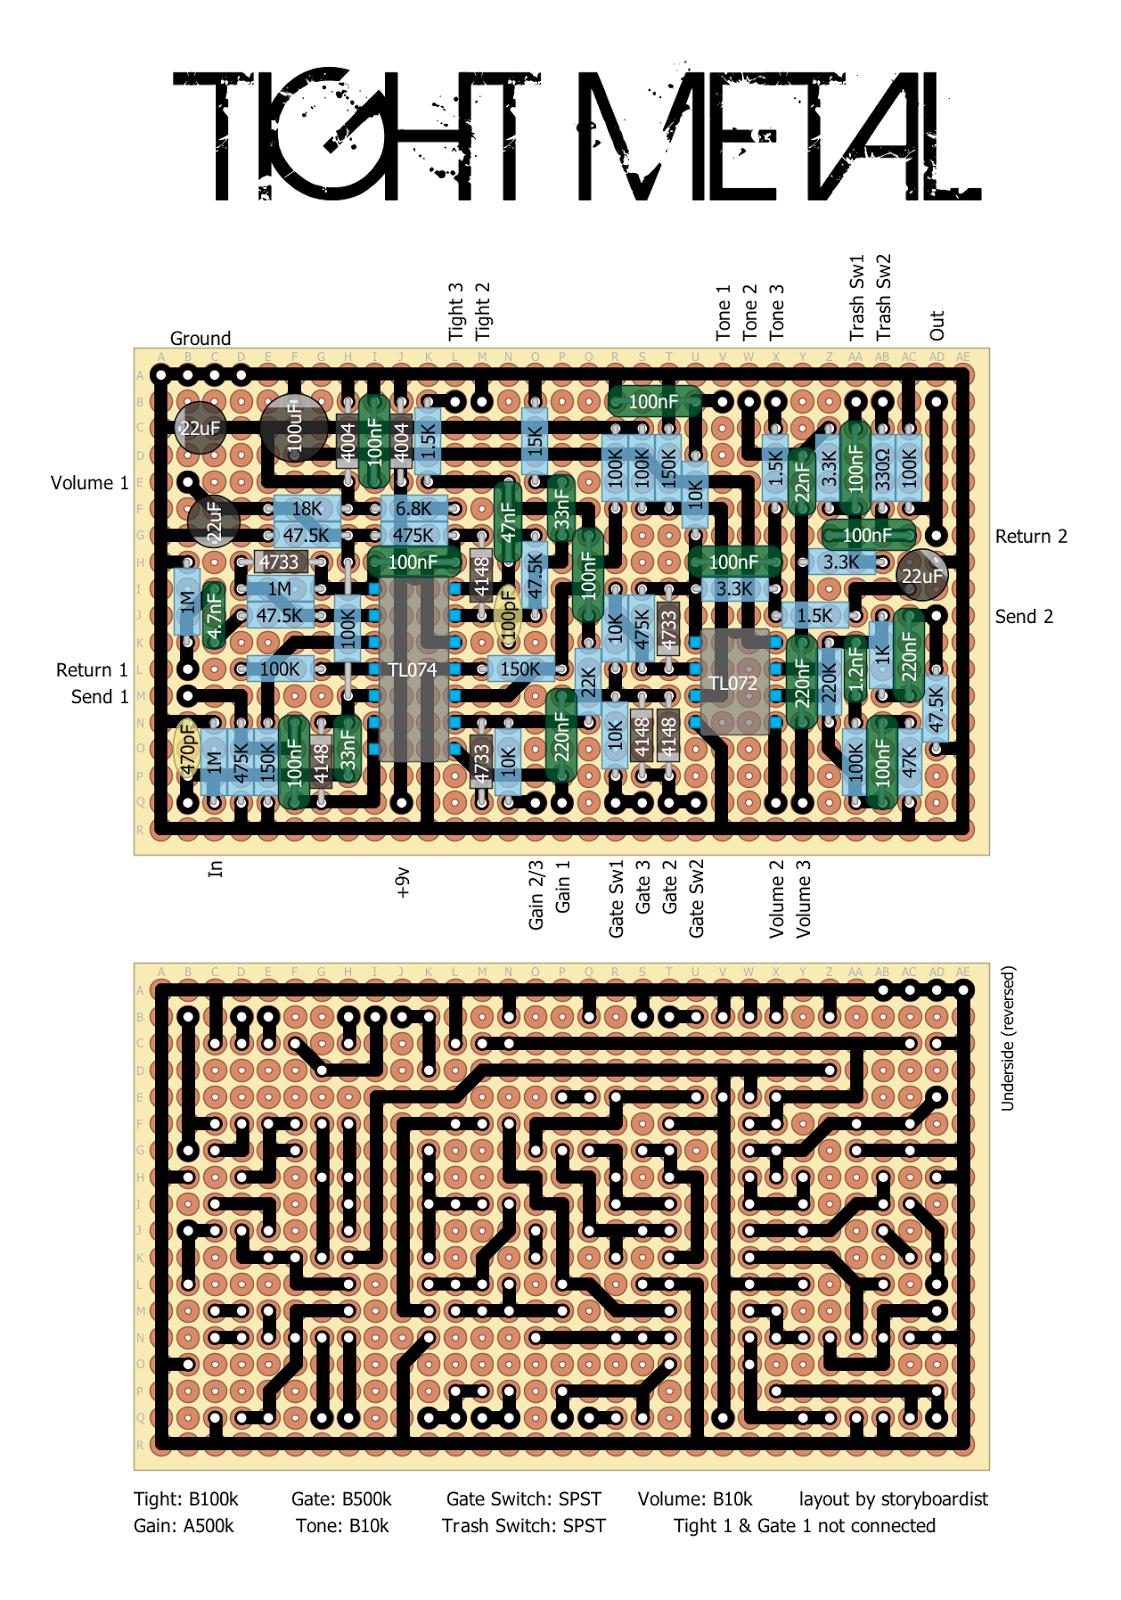 medium resolution of vga to rca converter wiring diagram images joystick usb wiring diagram also dvi to vga pinout